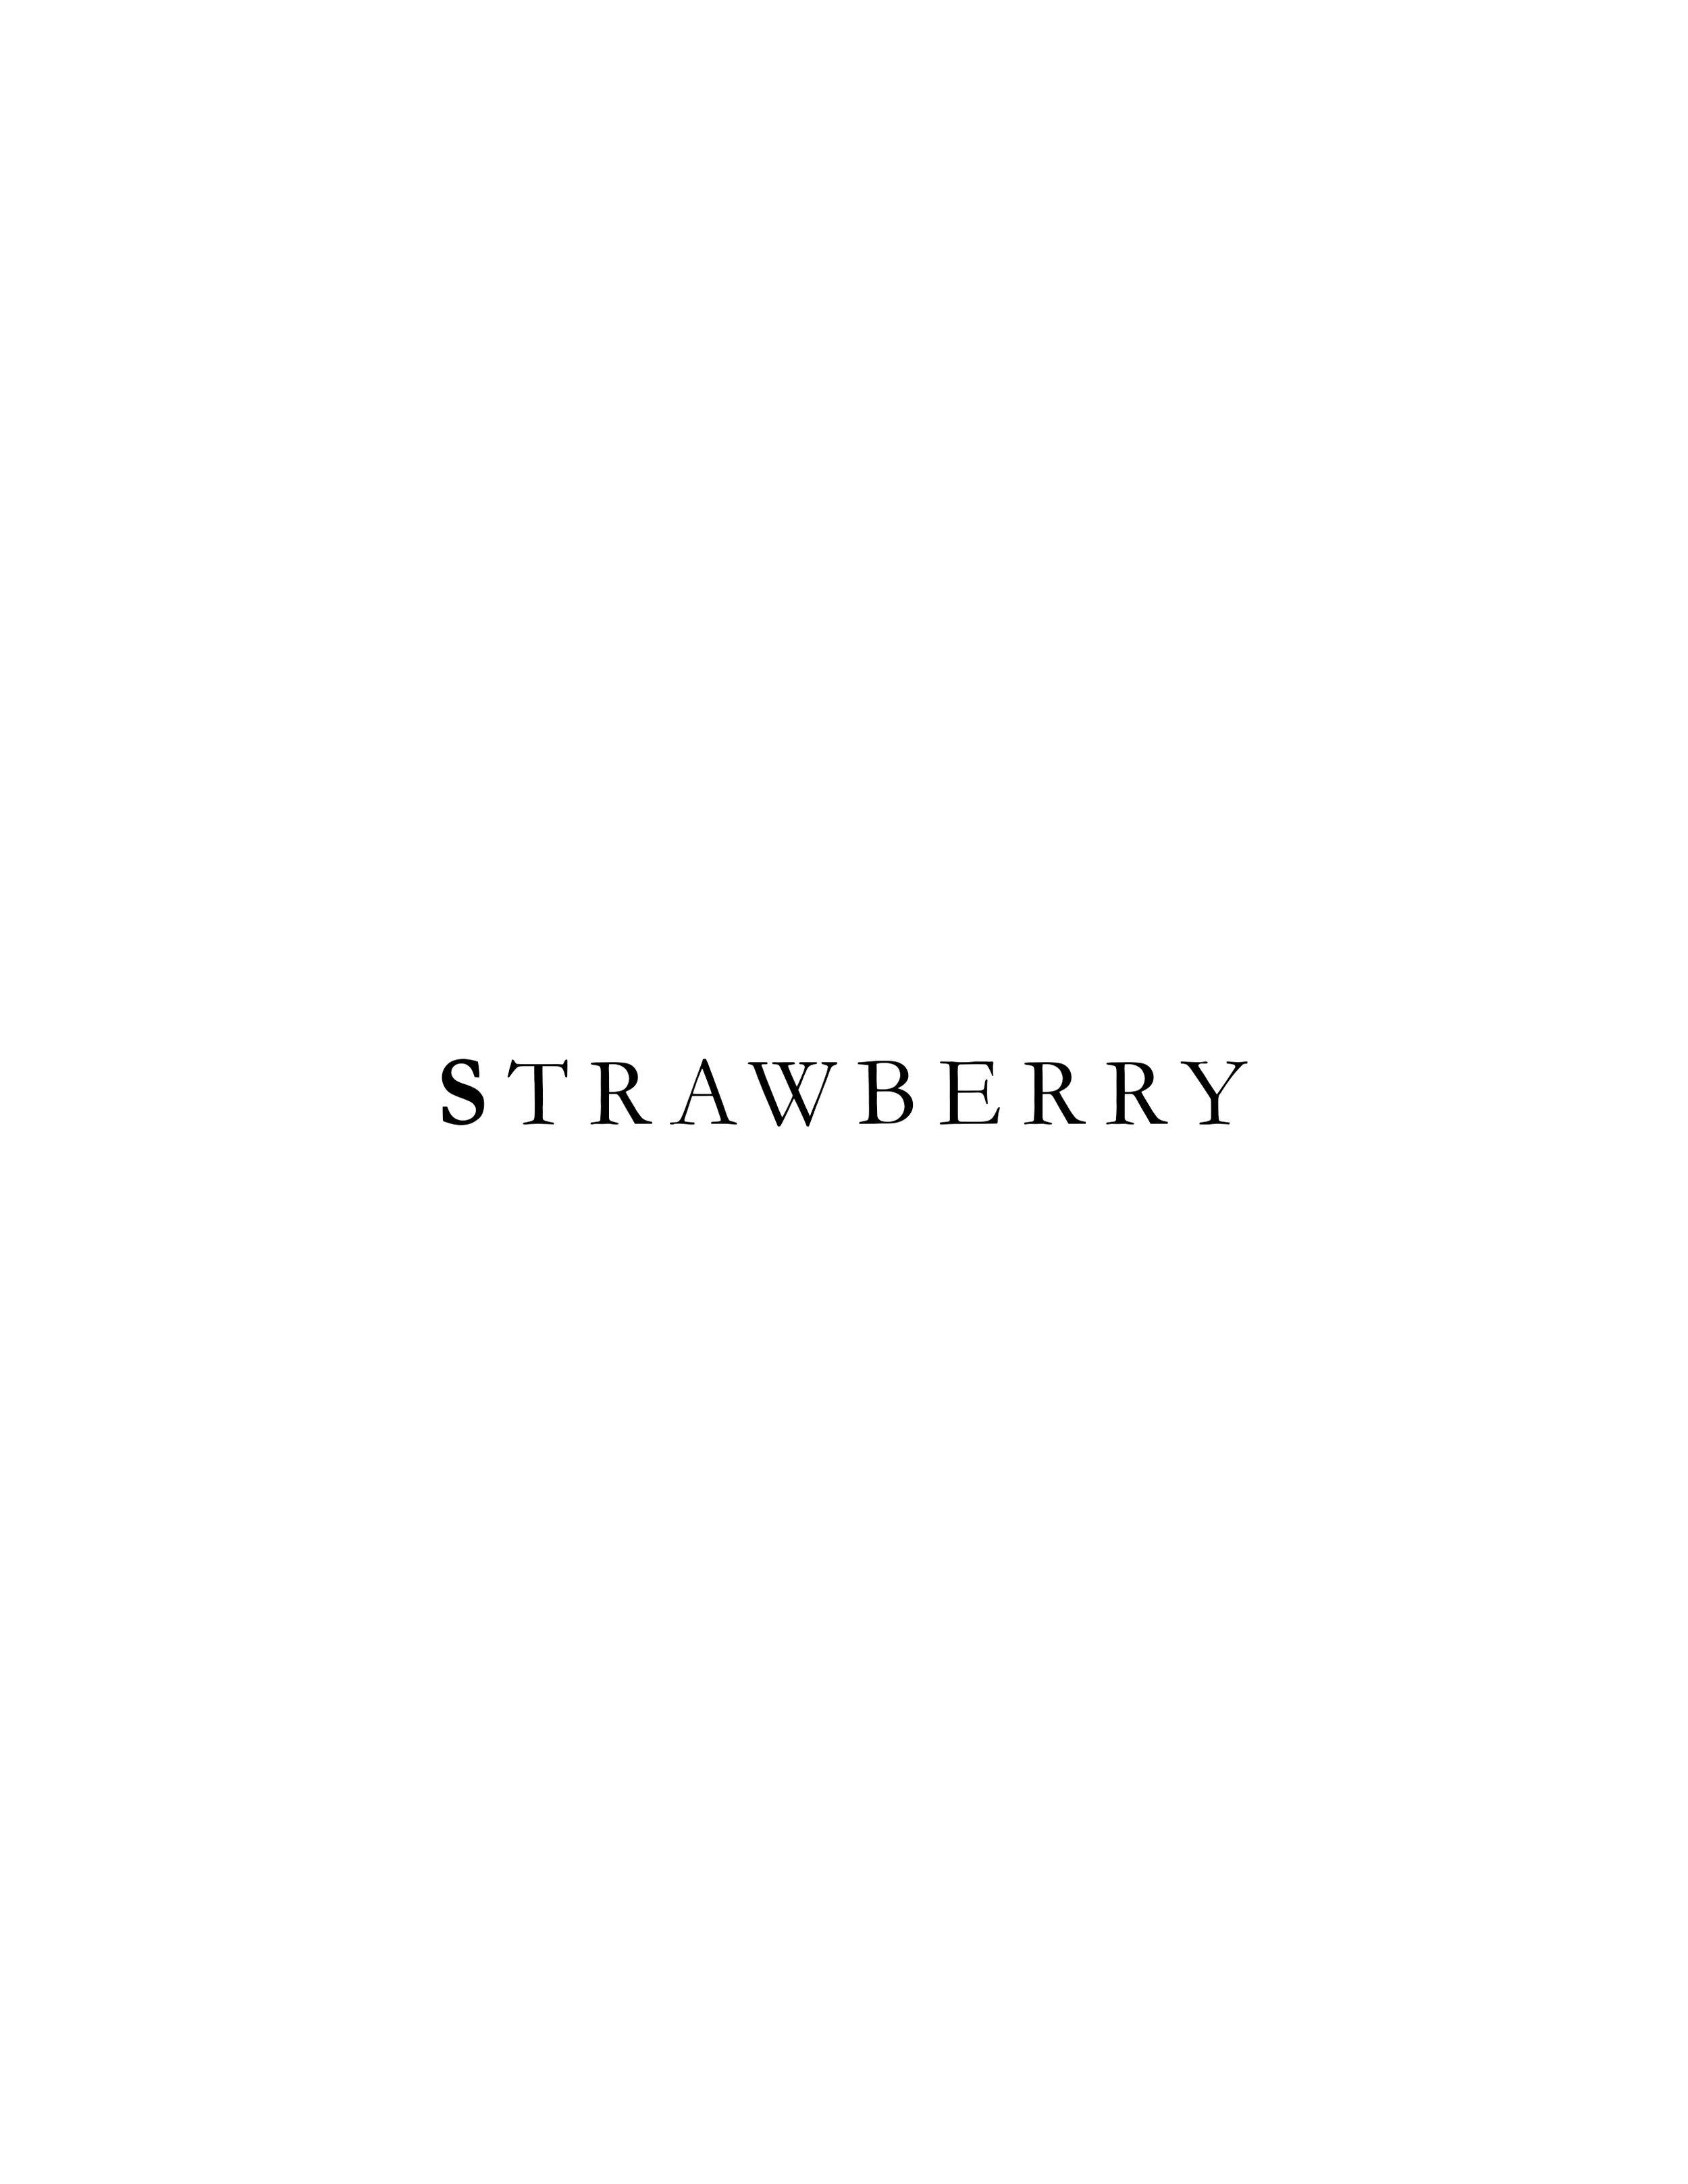 Strawberry TEXT.jpg